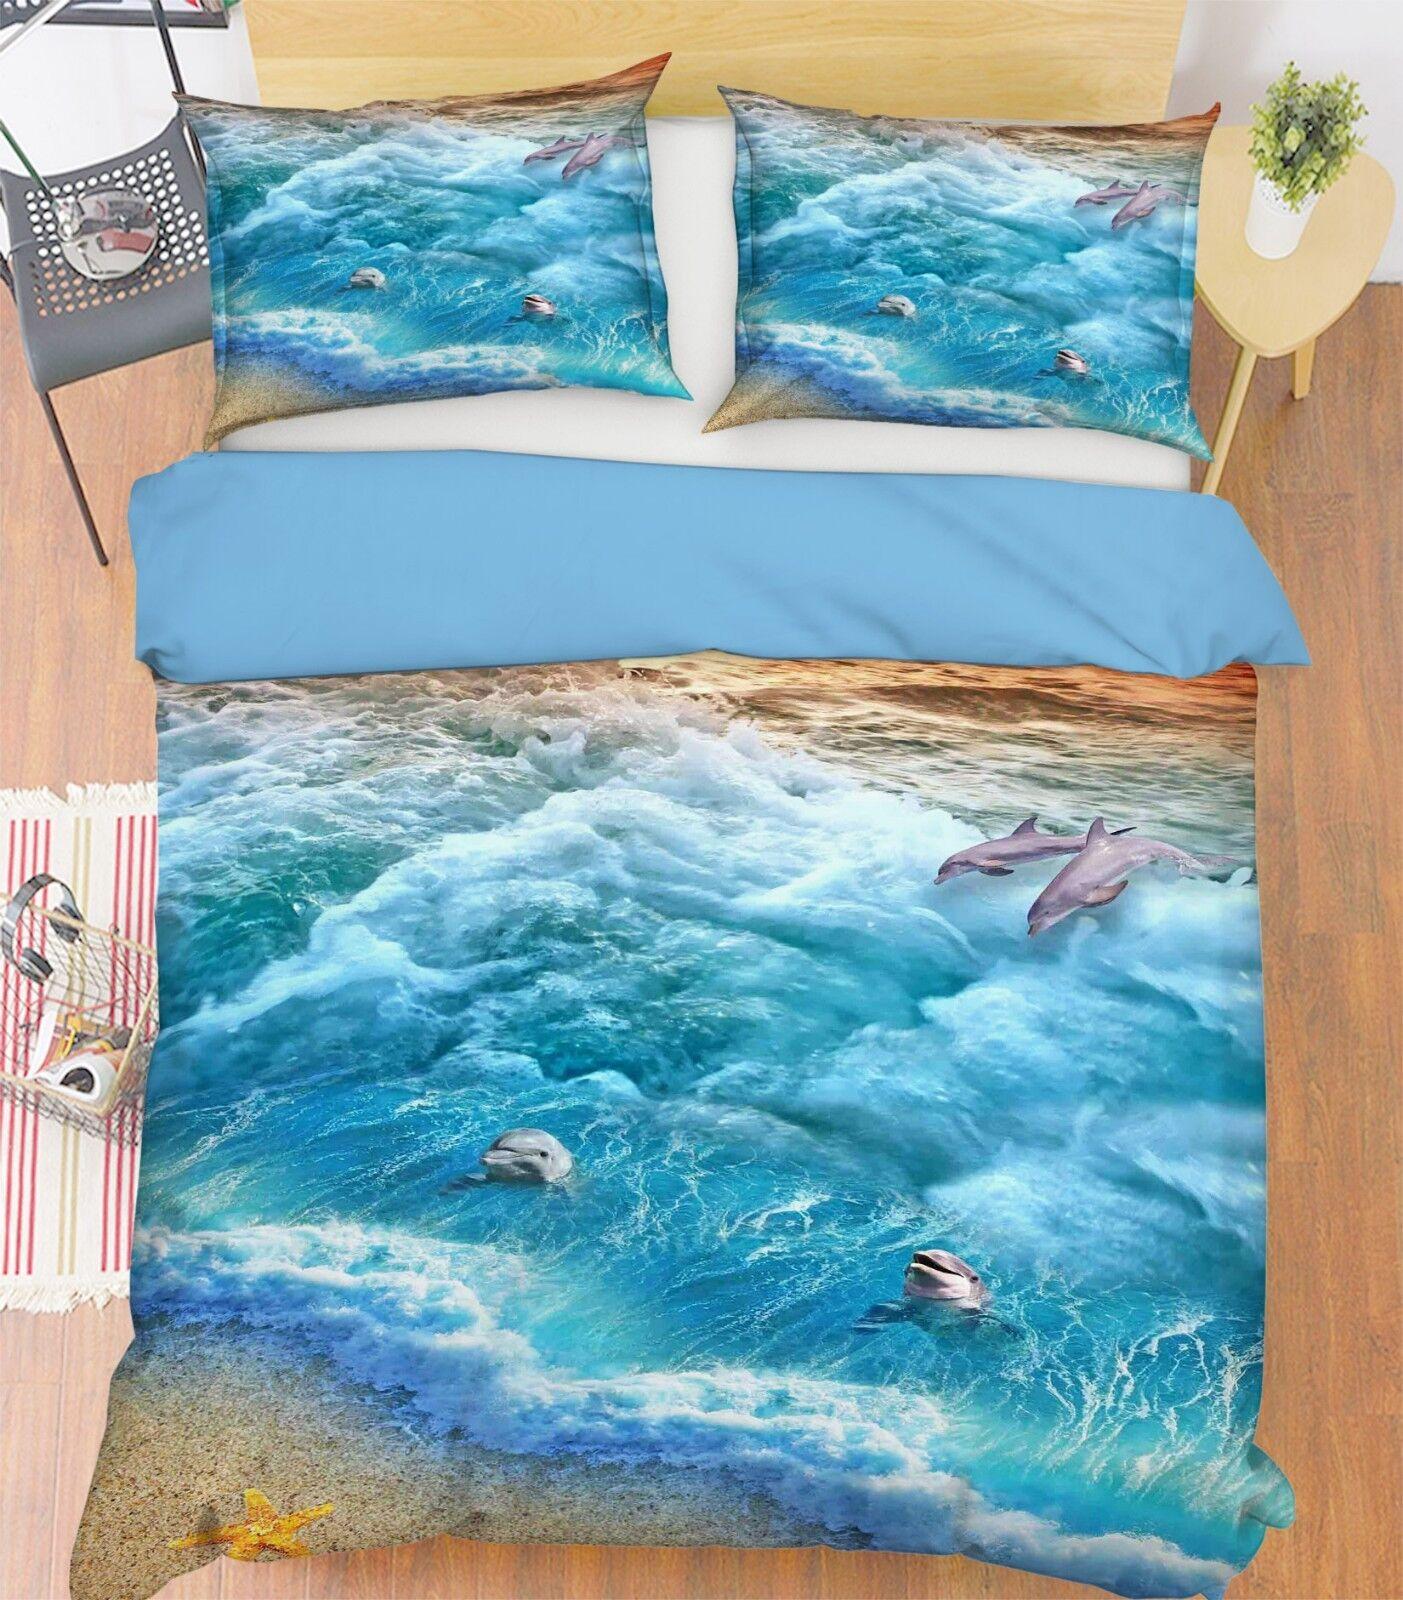 Good Morning Bettwäsche 5946 Delfin Blau Meer Ozean